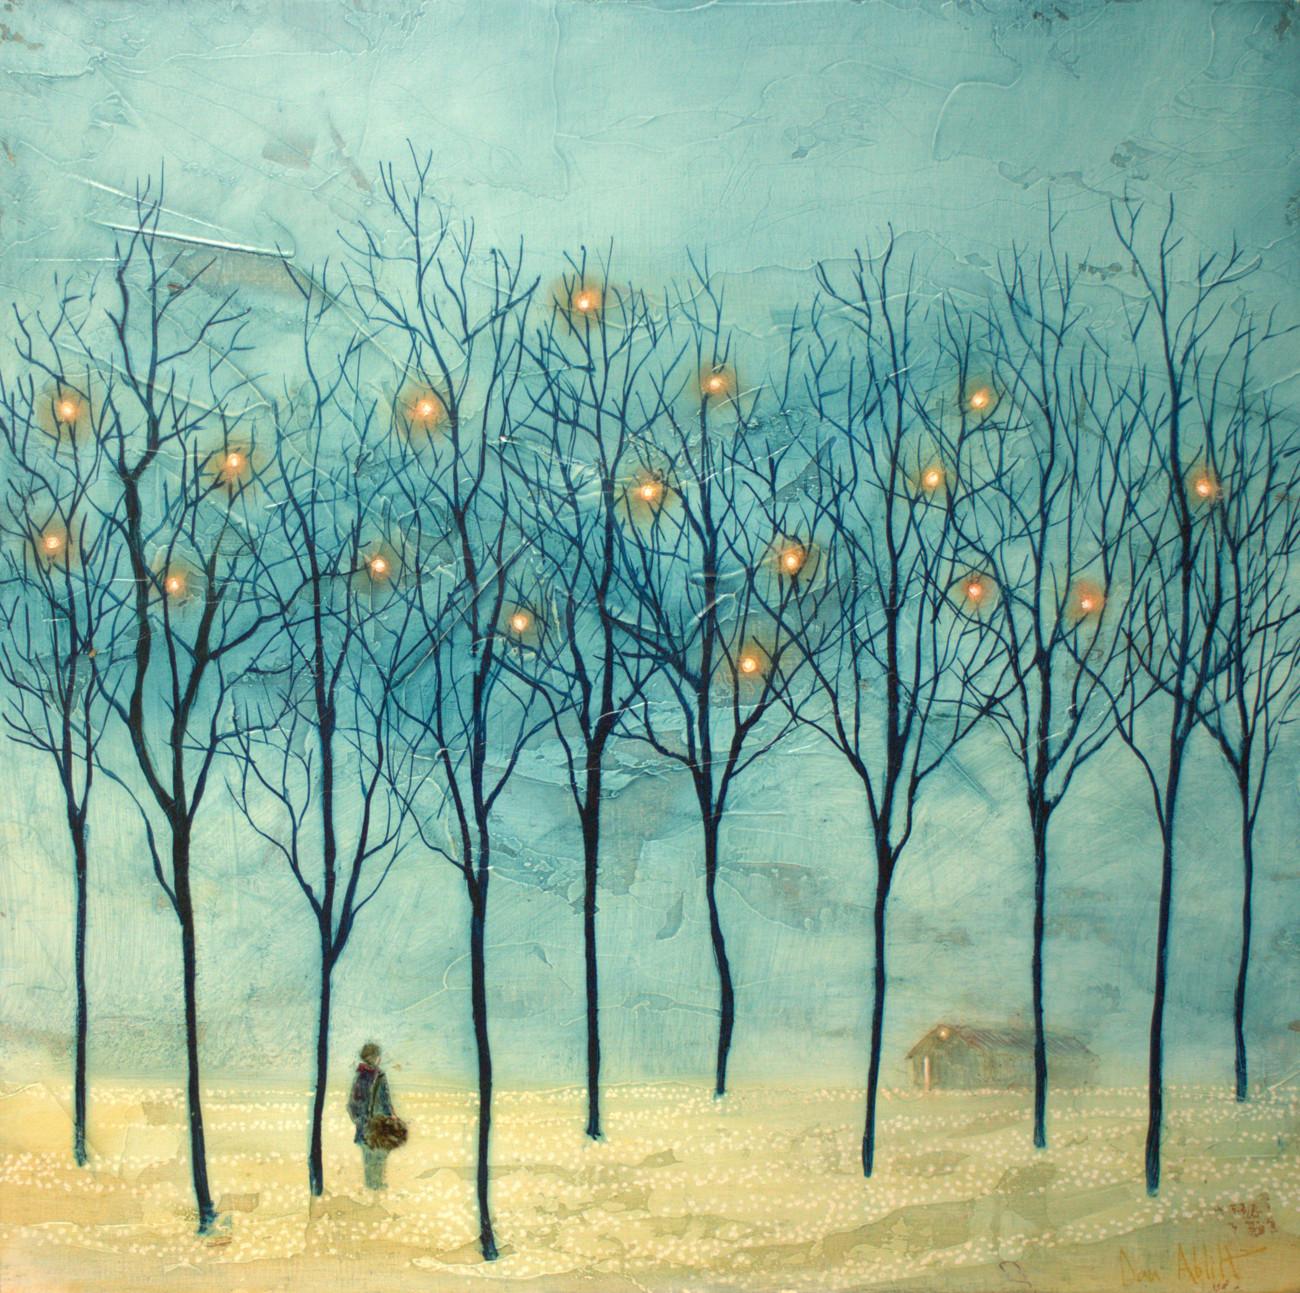 Daniel Ablitt 'Refuge' original oil painting